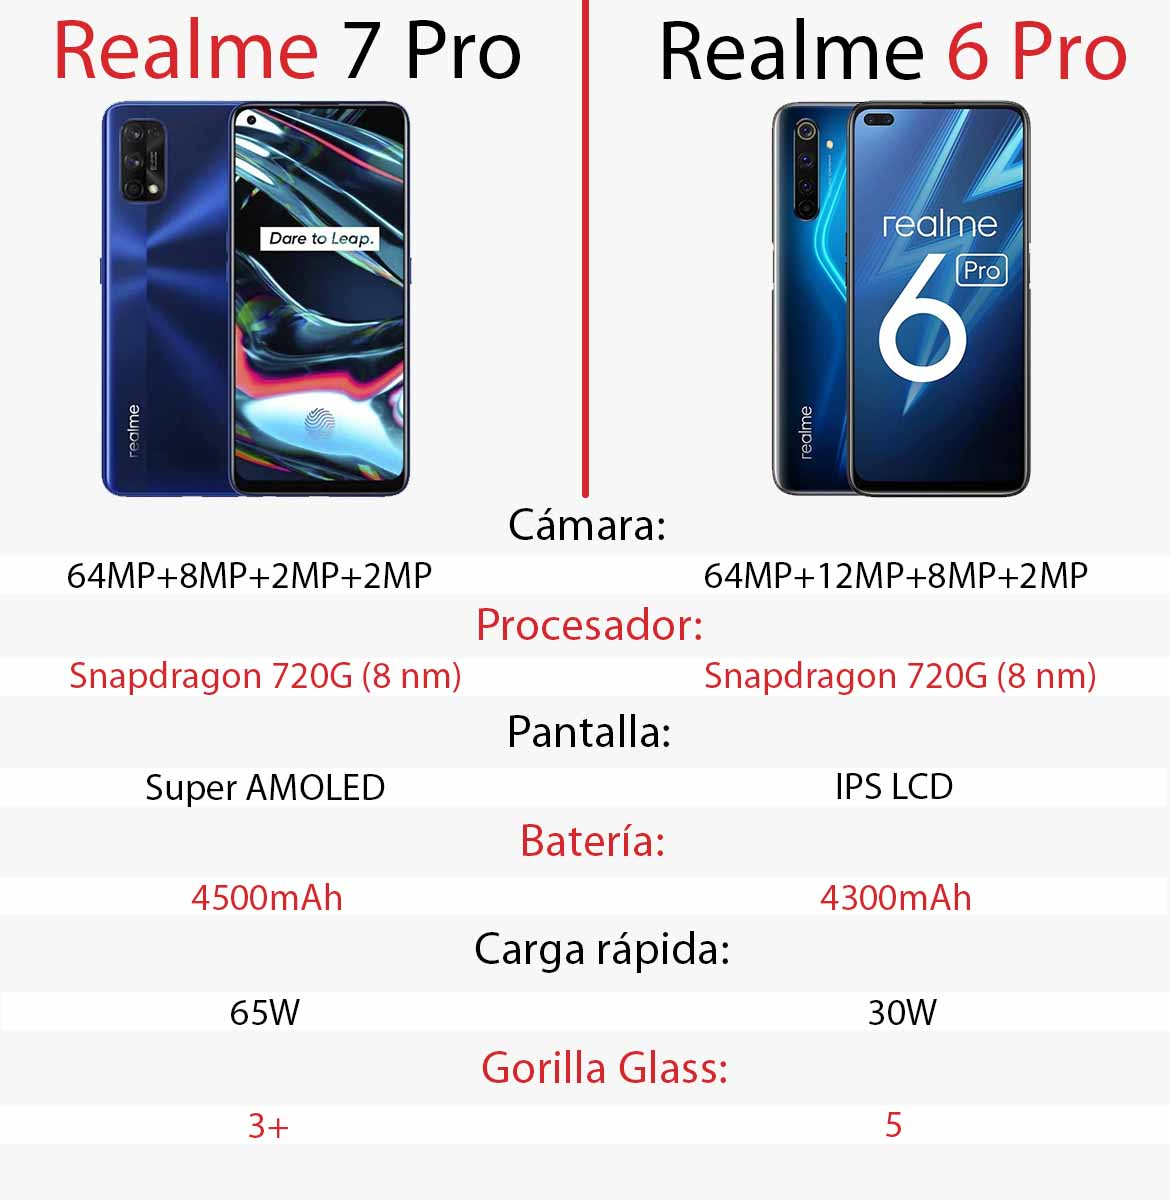 Comparativa de celulares Realme 7 Pro vs Realme 6 Pro